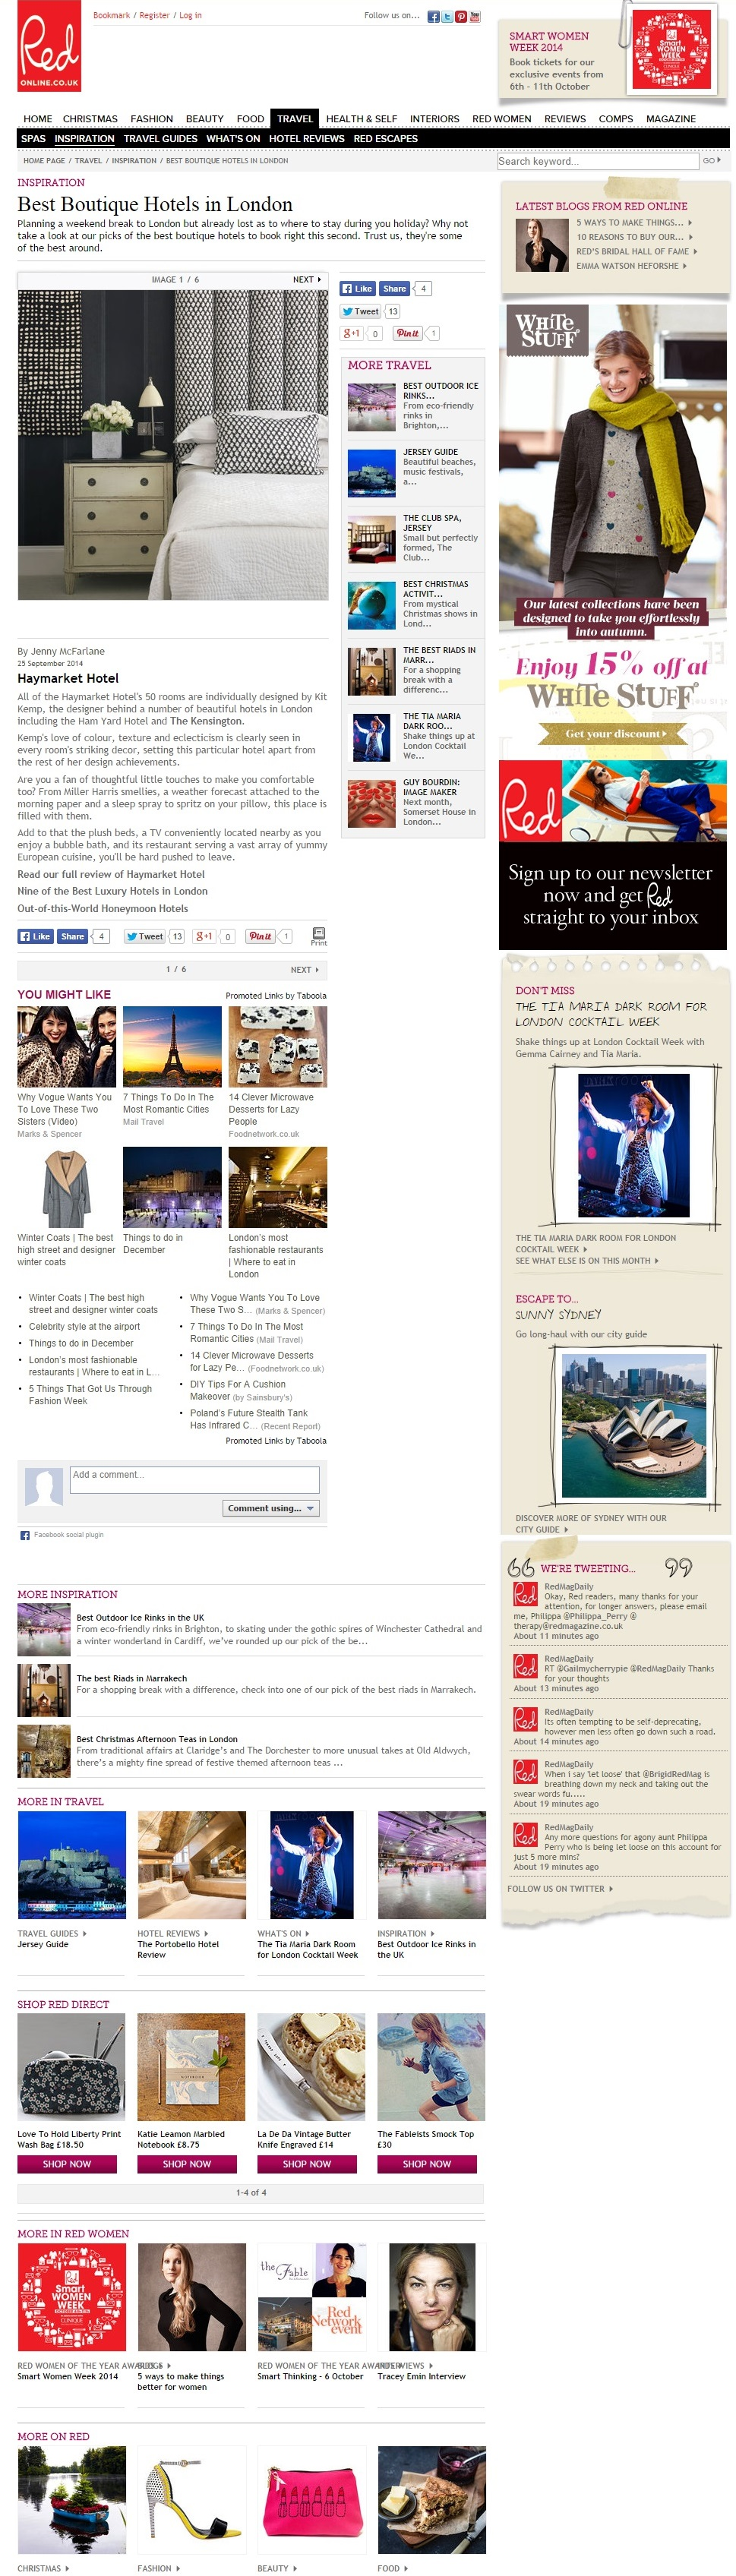 screencapture-www-redonline-co-uk-travel-inspiration-best-boutique-hotels